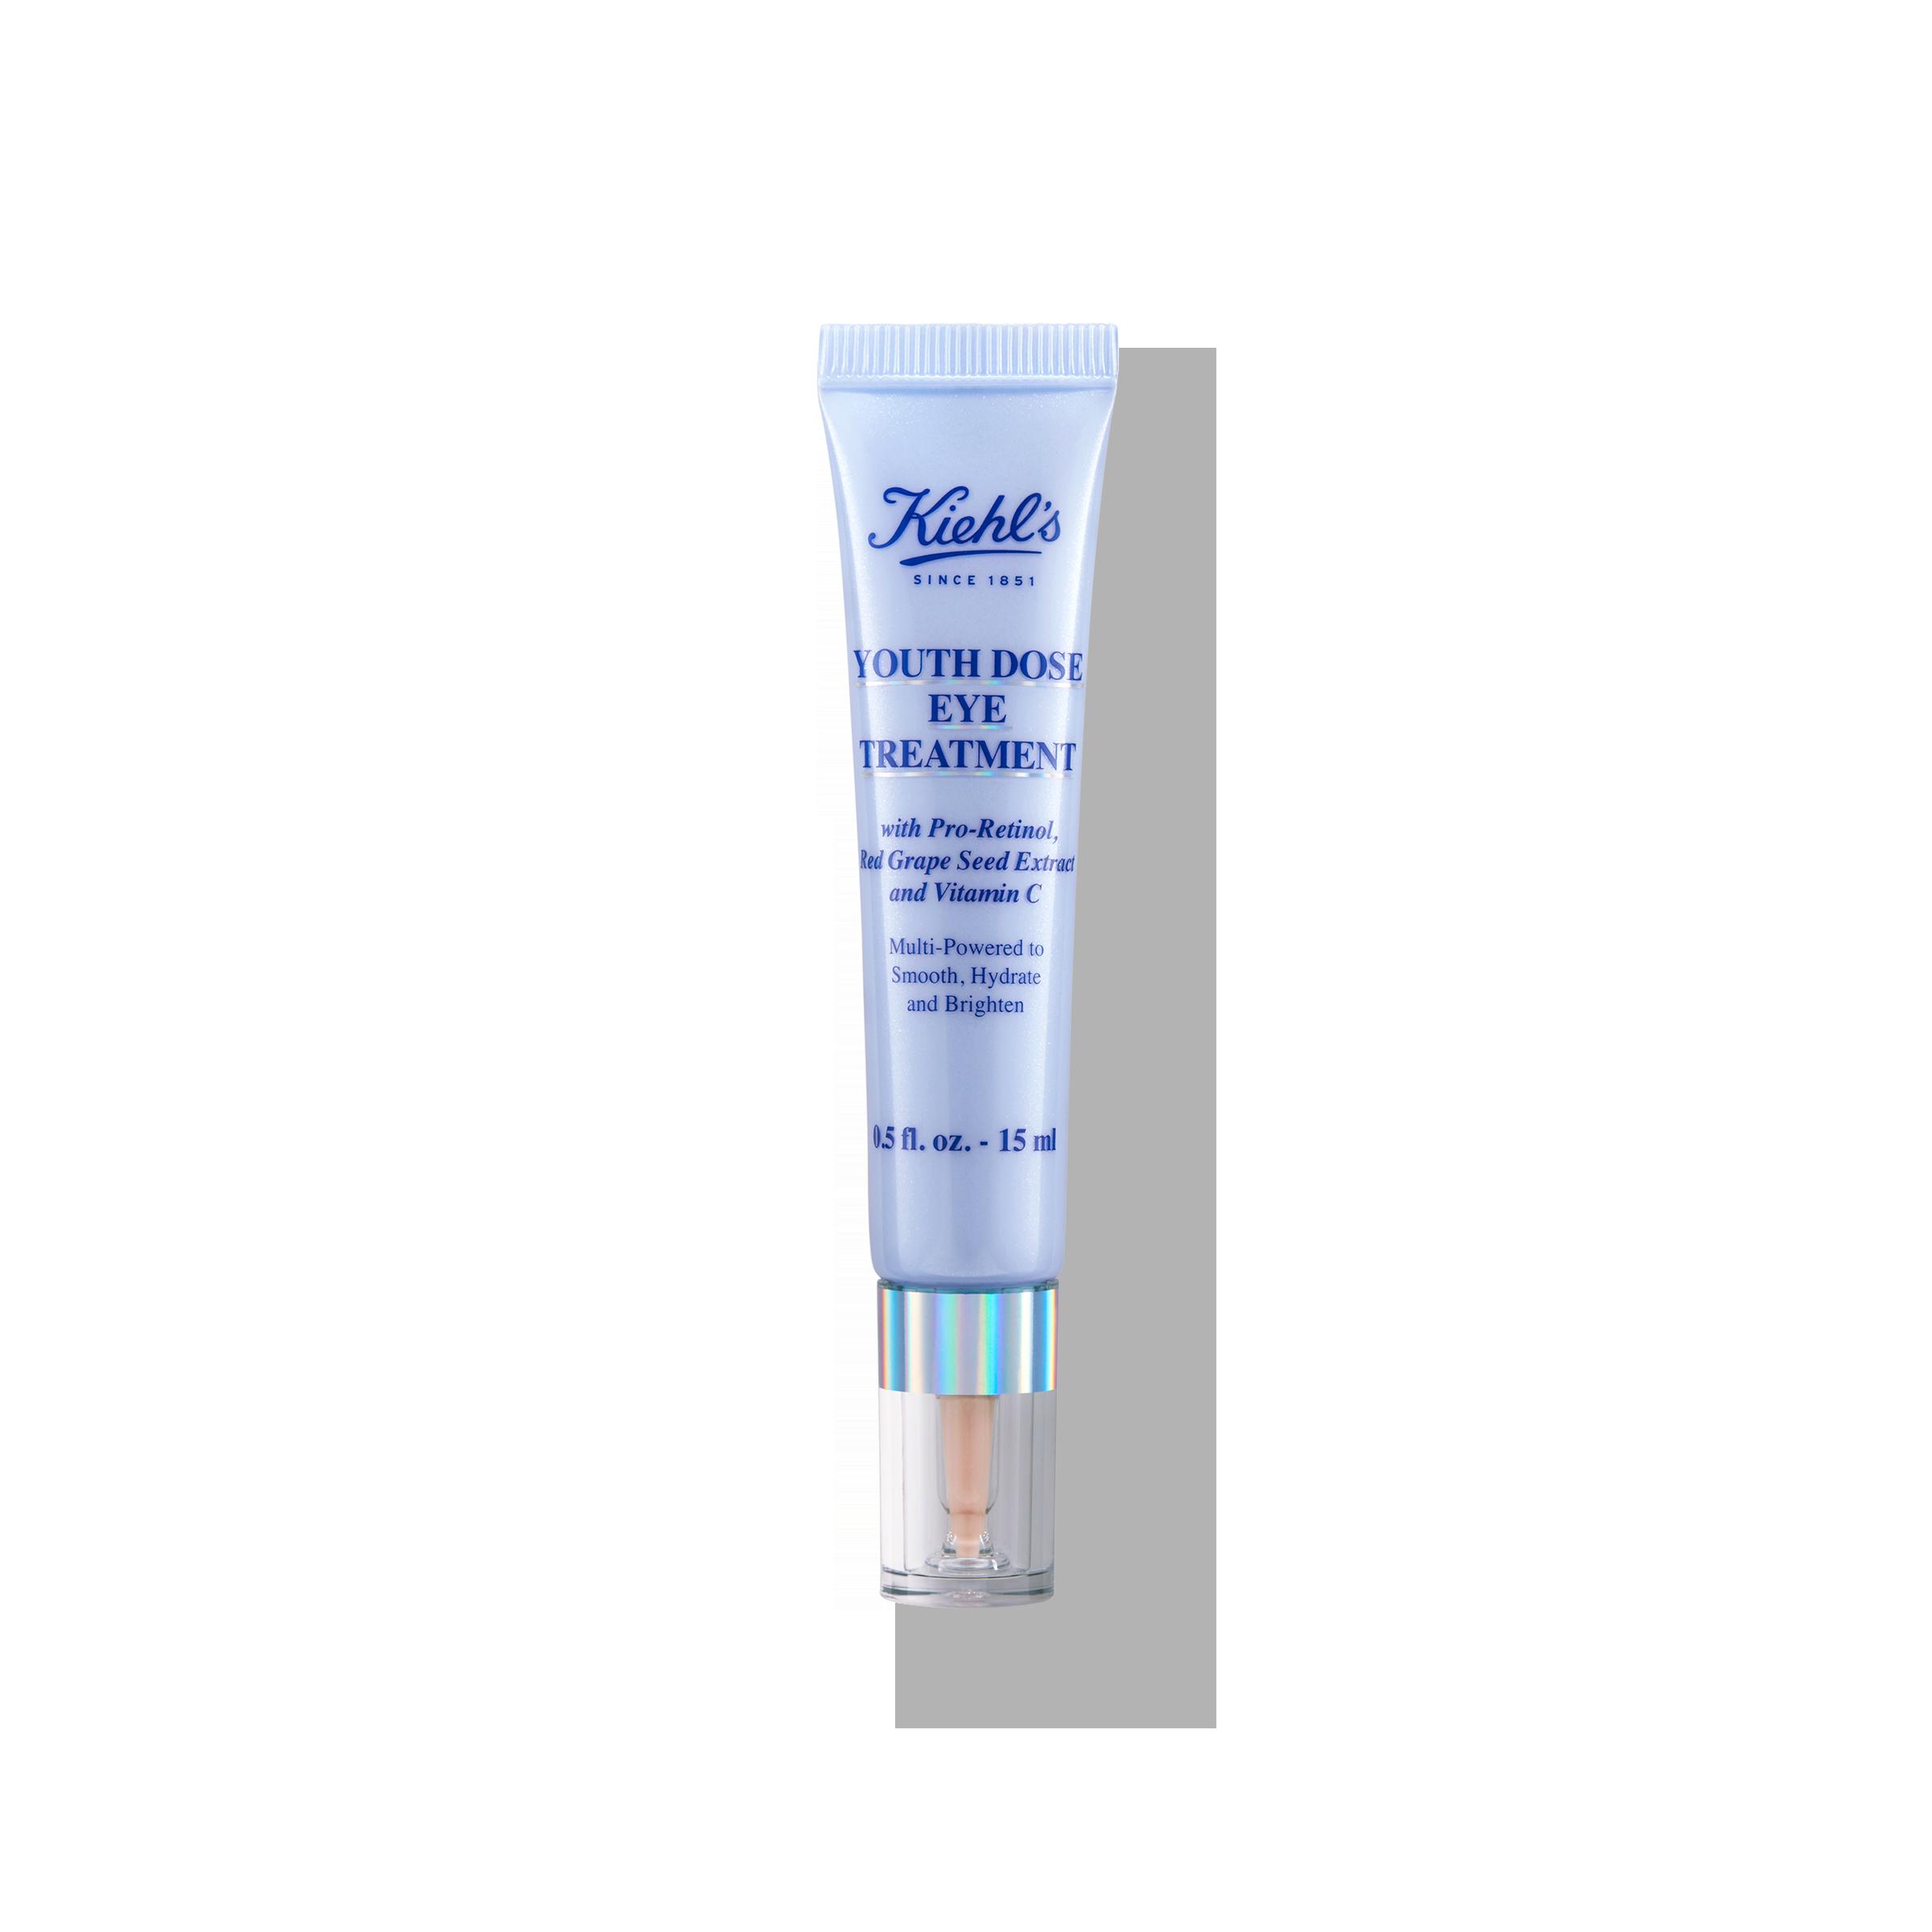 Youth Dose Eye Treatment Eye Cream With Pro Retinol Kiehl S